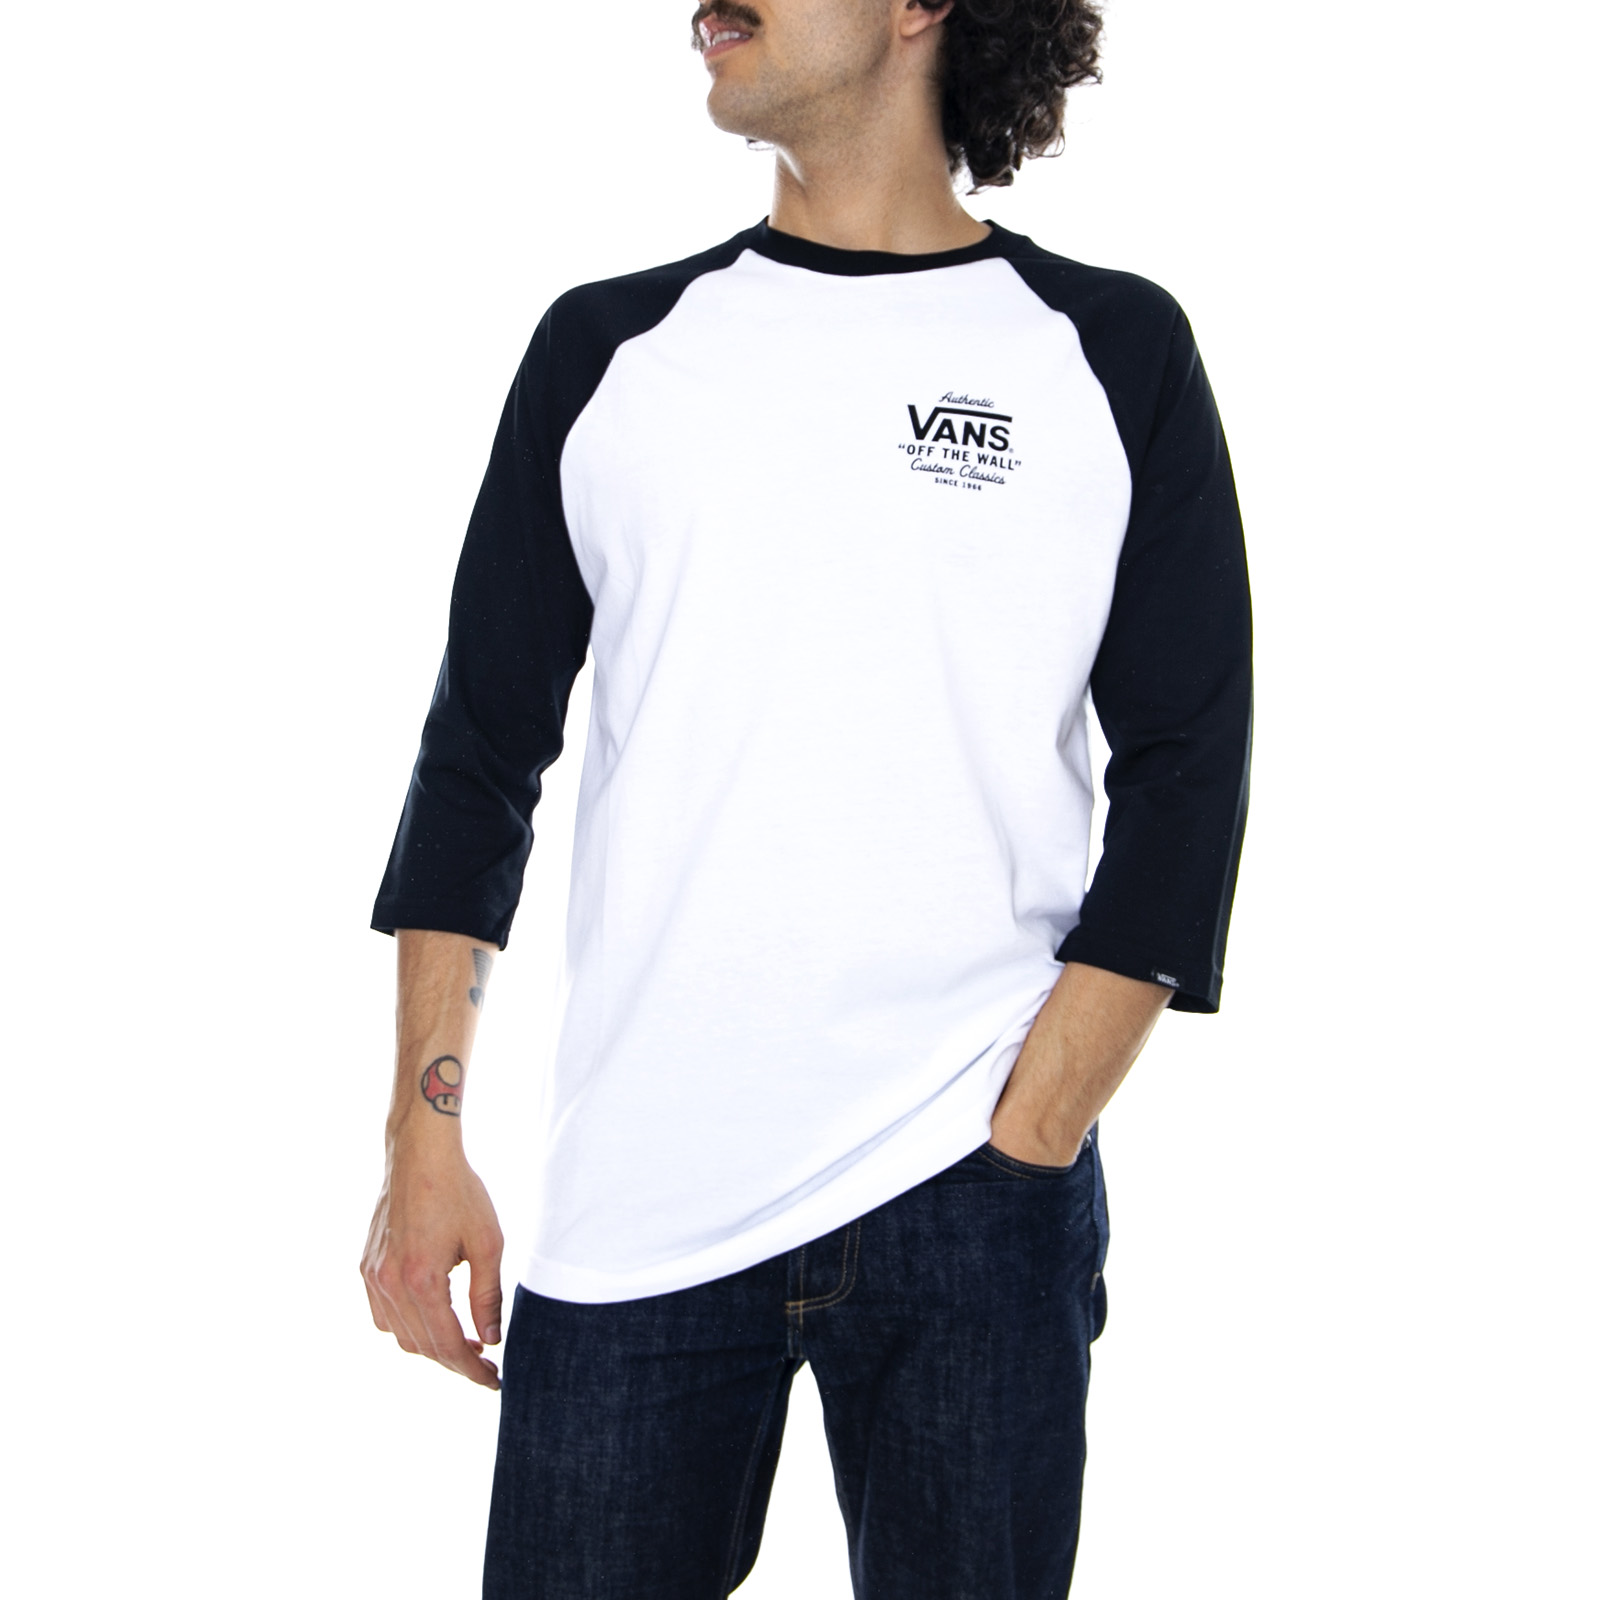 Detalles de Vans Mn Titular BlancoBlack Camiseta Mangas 34 Hombre Multicolor